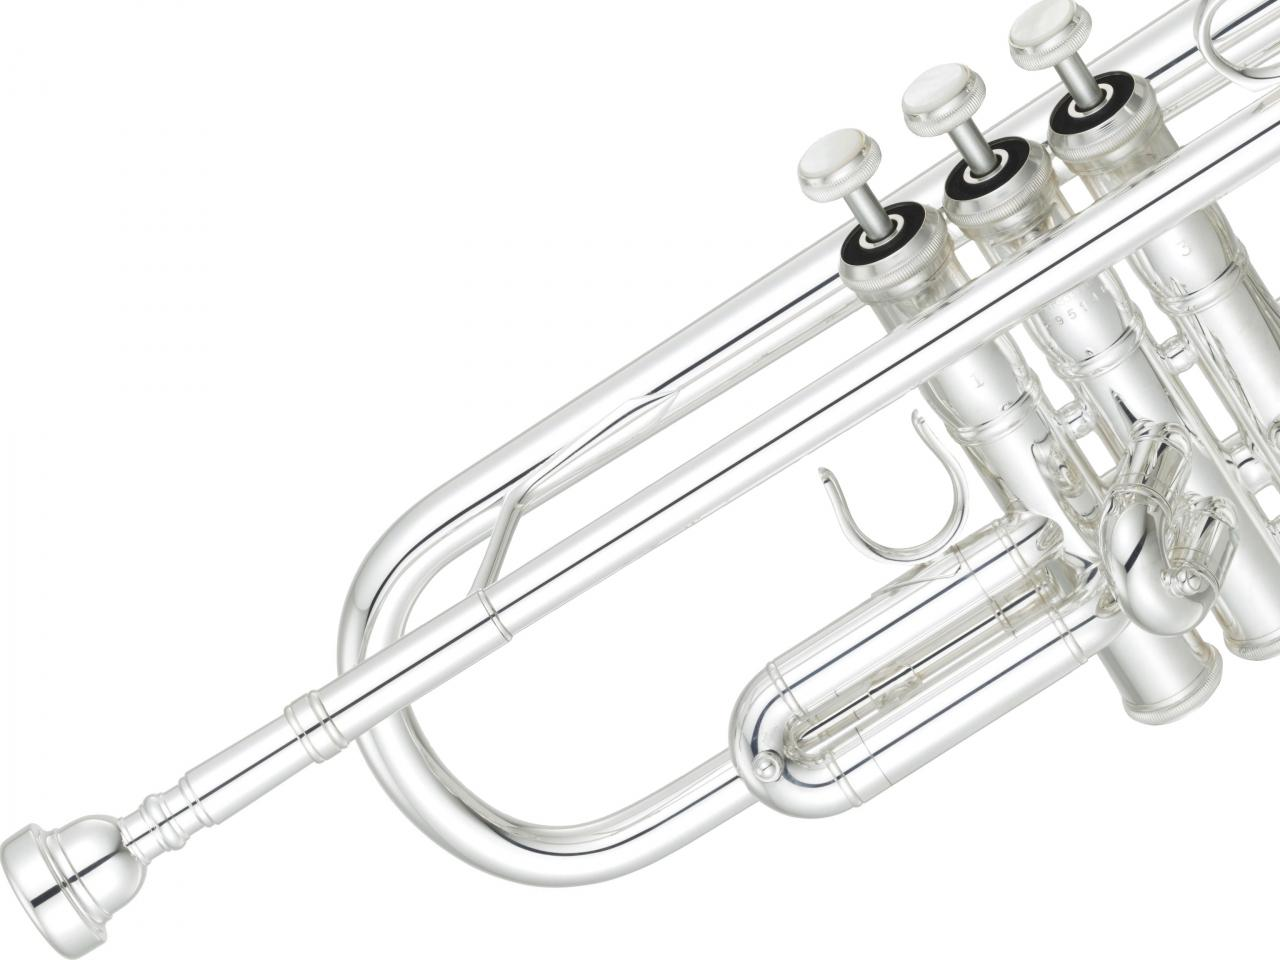 Yamaha Ytr Nys 04 B Trompete Xeno Artist